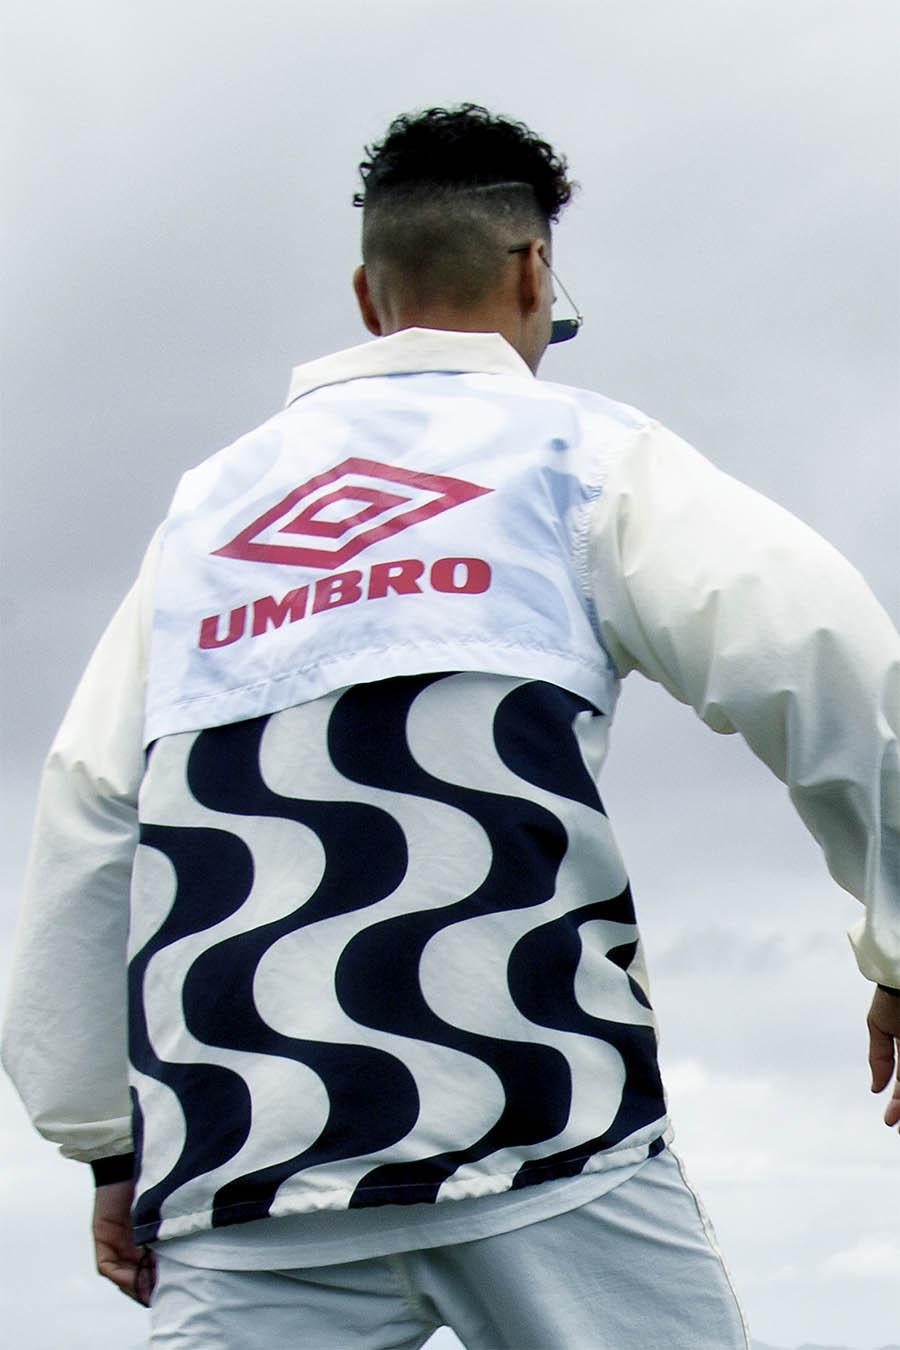 Kinfolk / Umbro